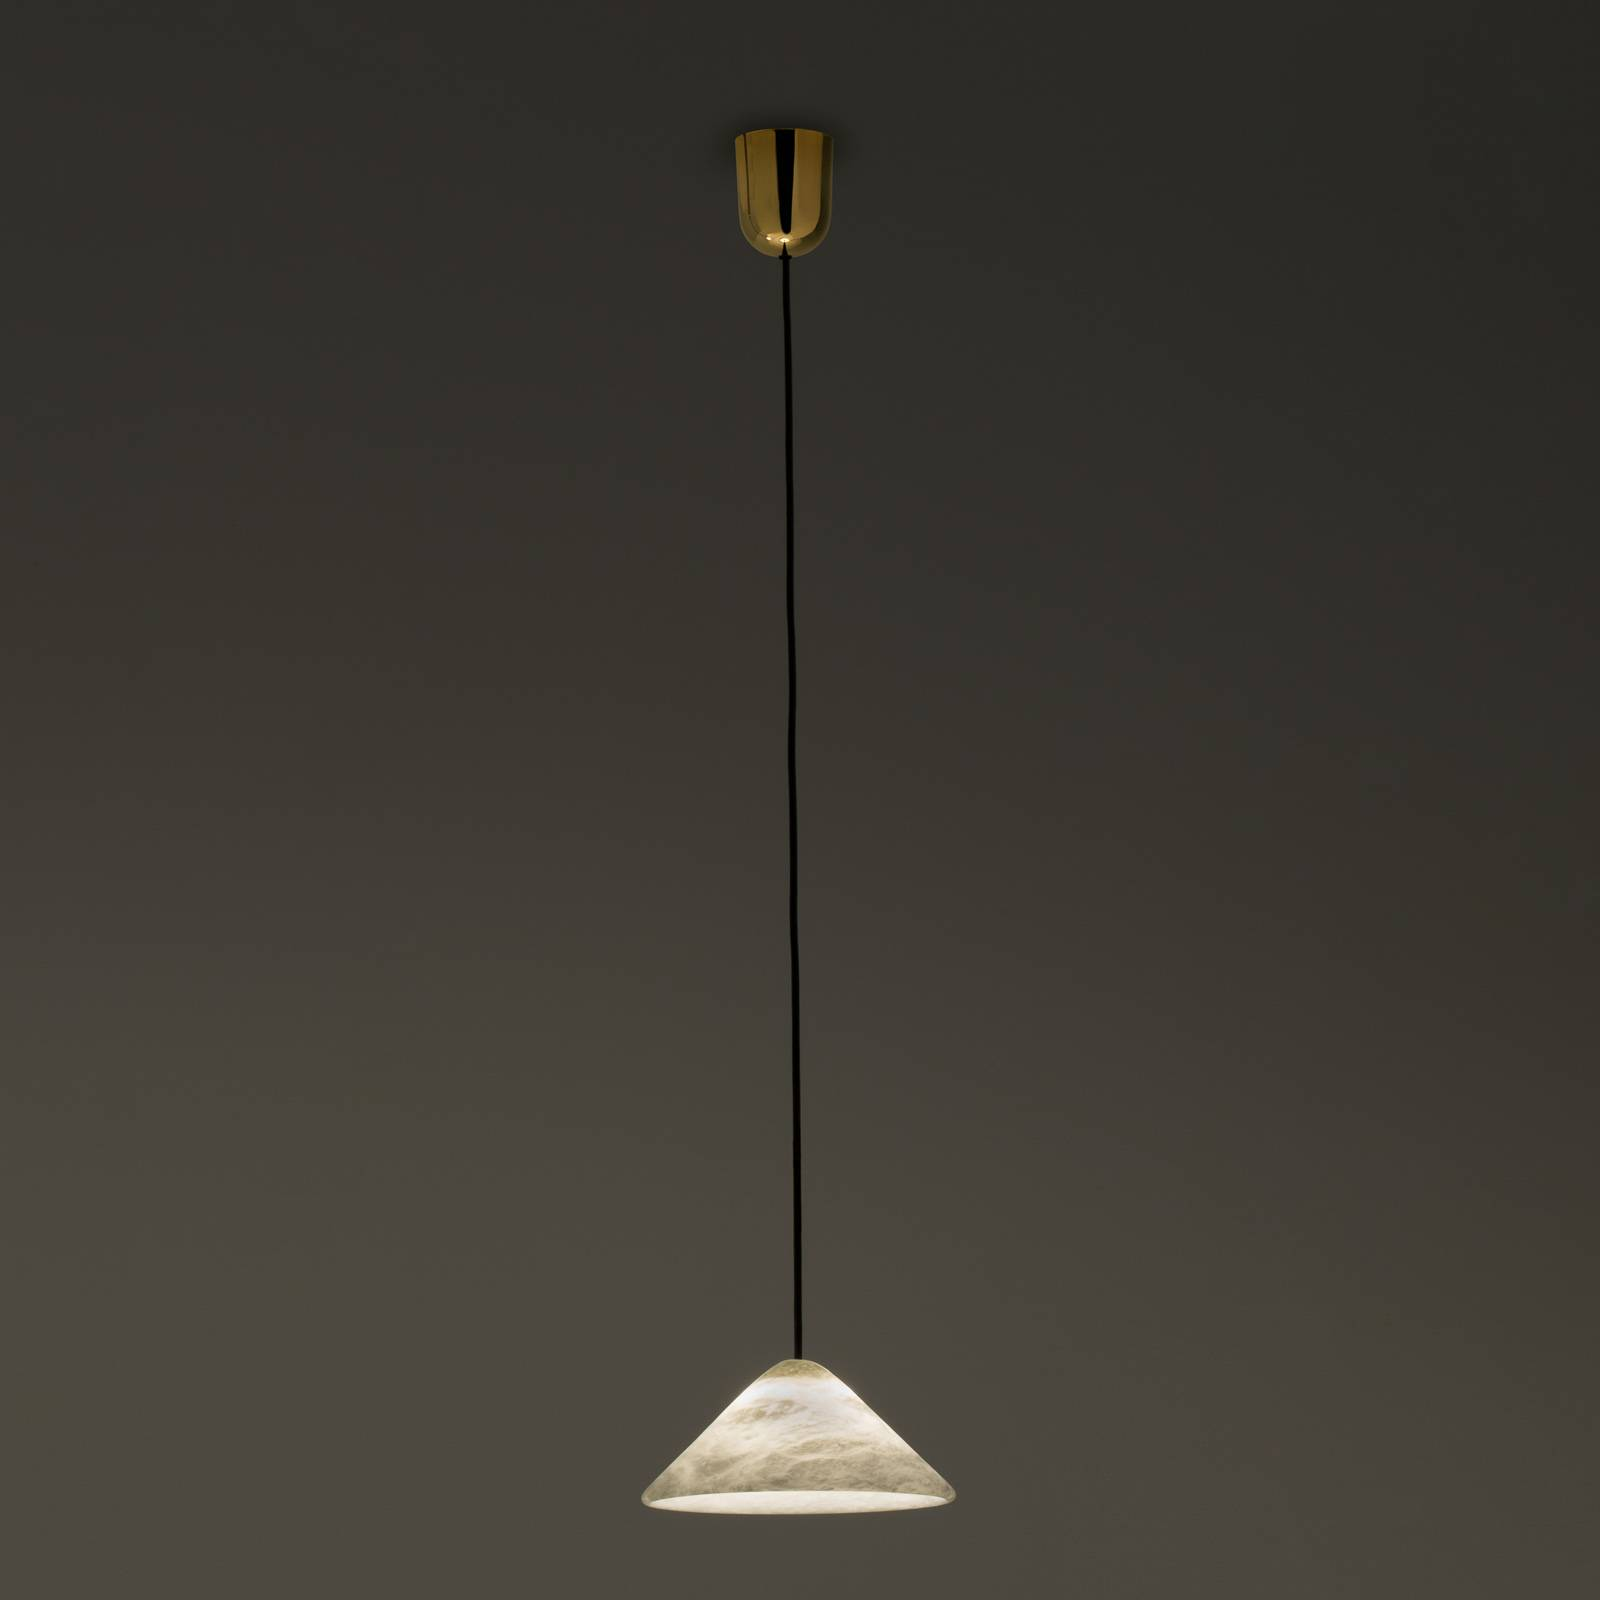 LED-riippuvalaisin Fuji alabasteria, Ø 21 cm